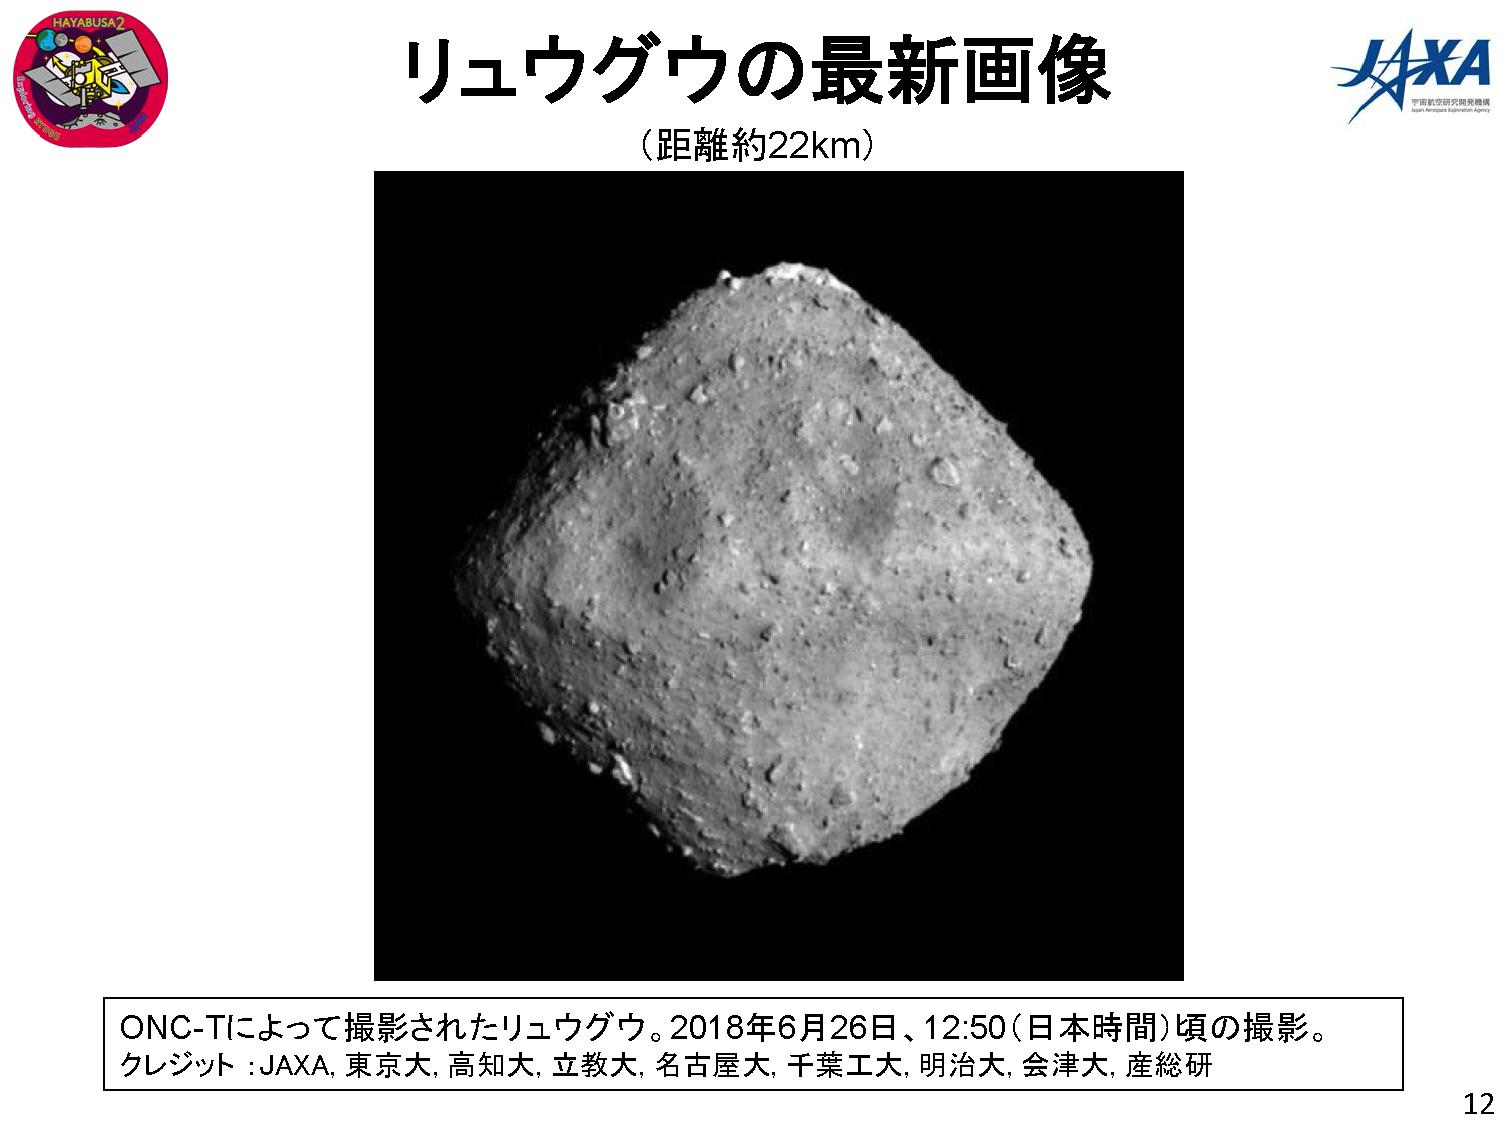 f:id:Imamura:20180627171841p:plain